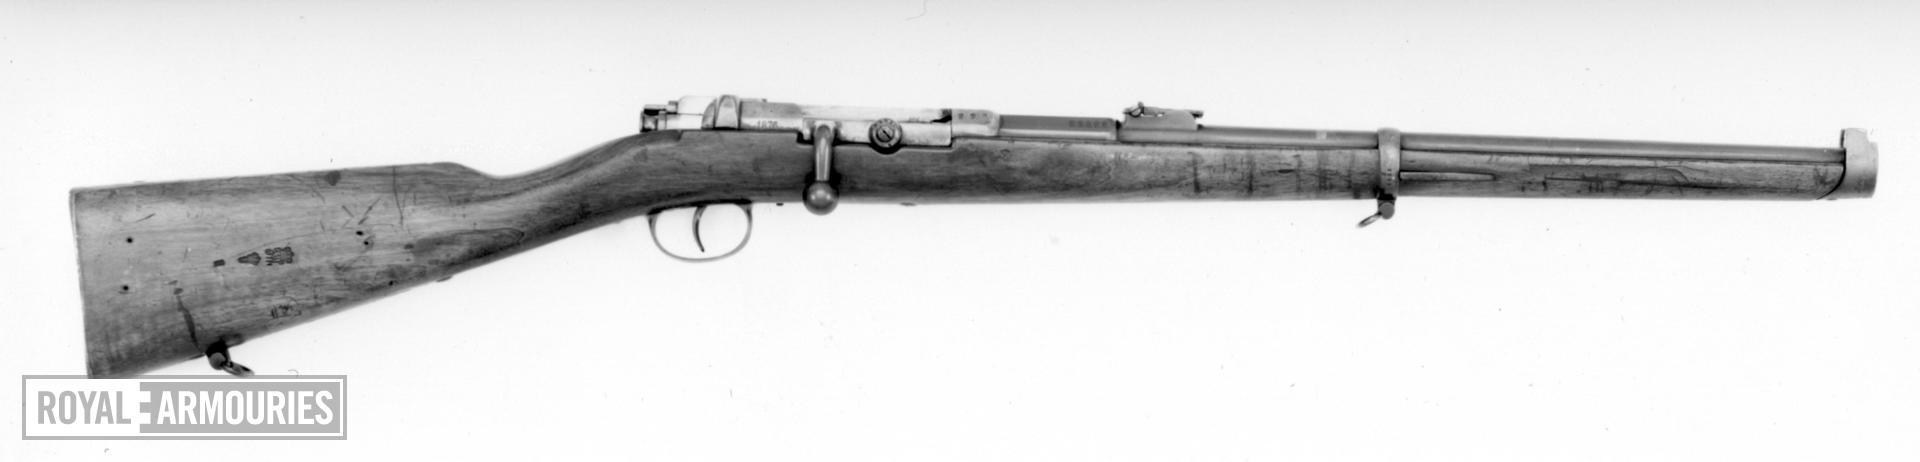 Centrefire military carbine - Model 1871